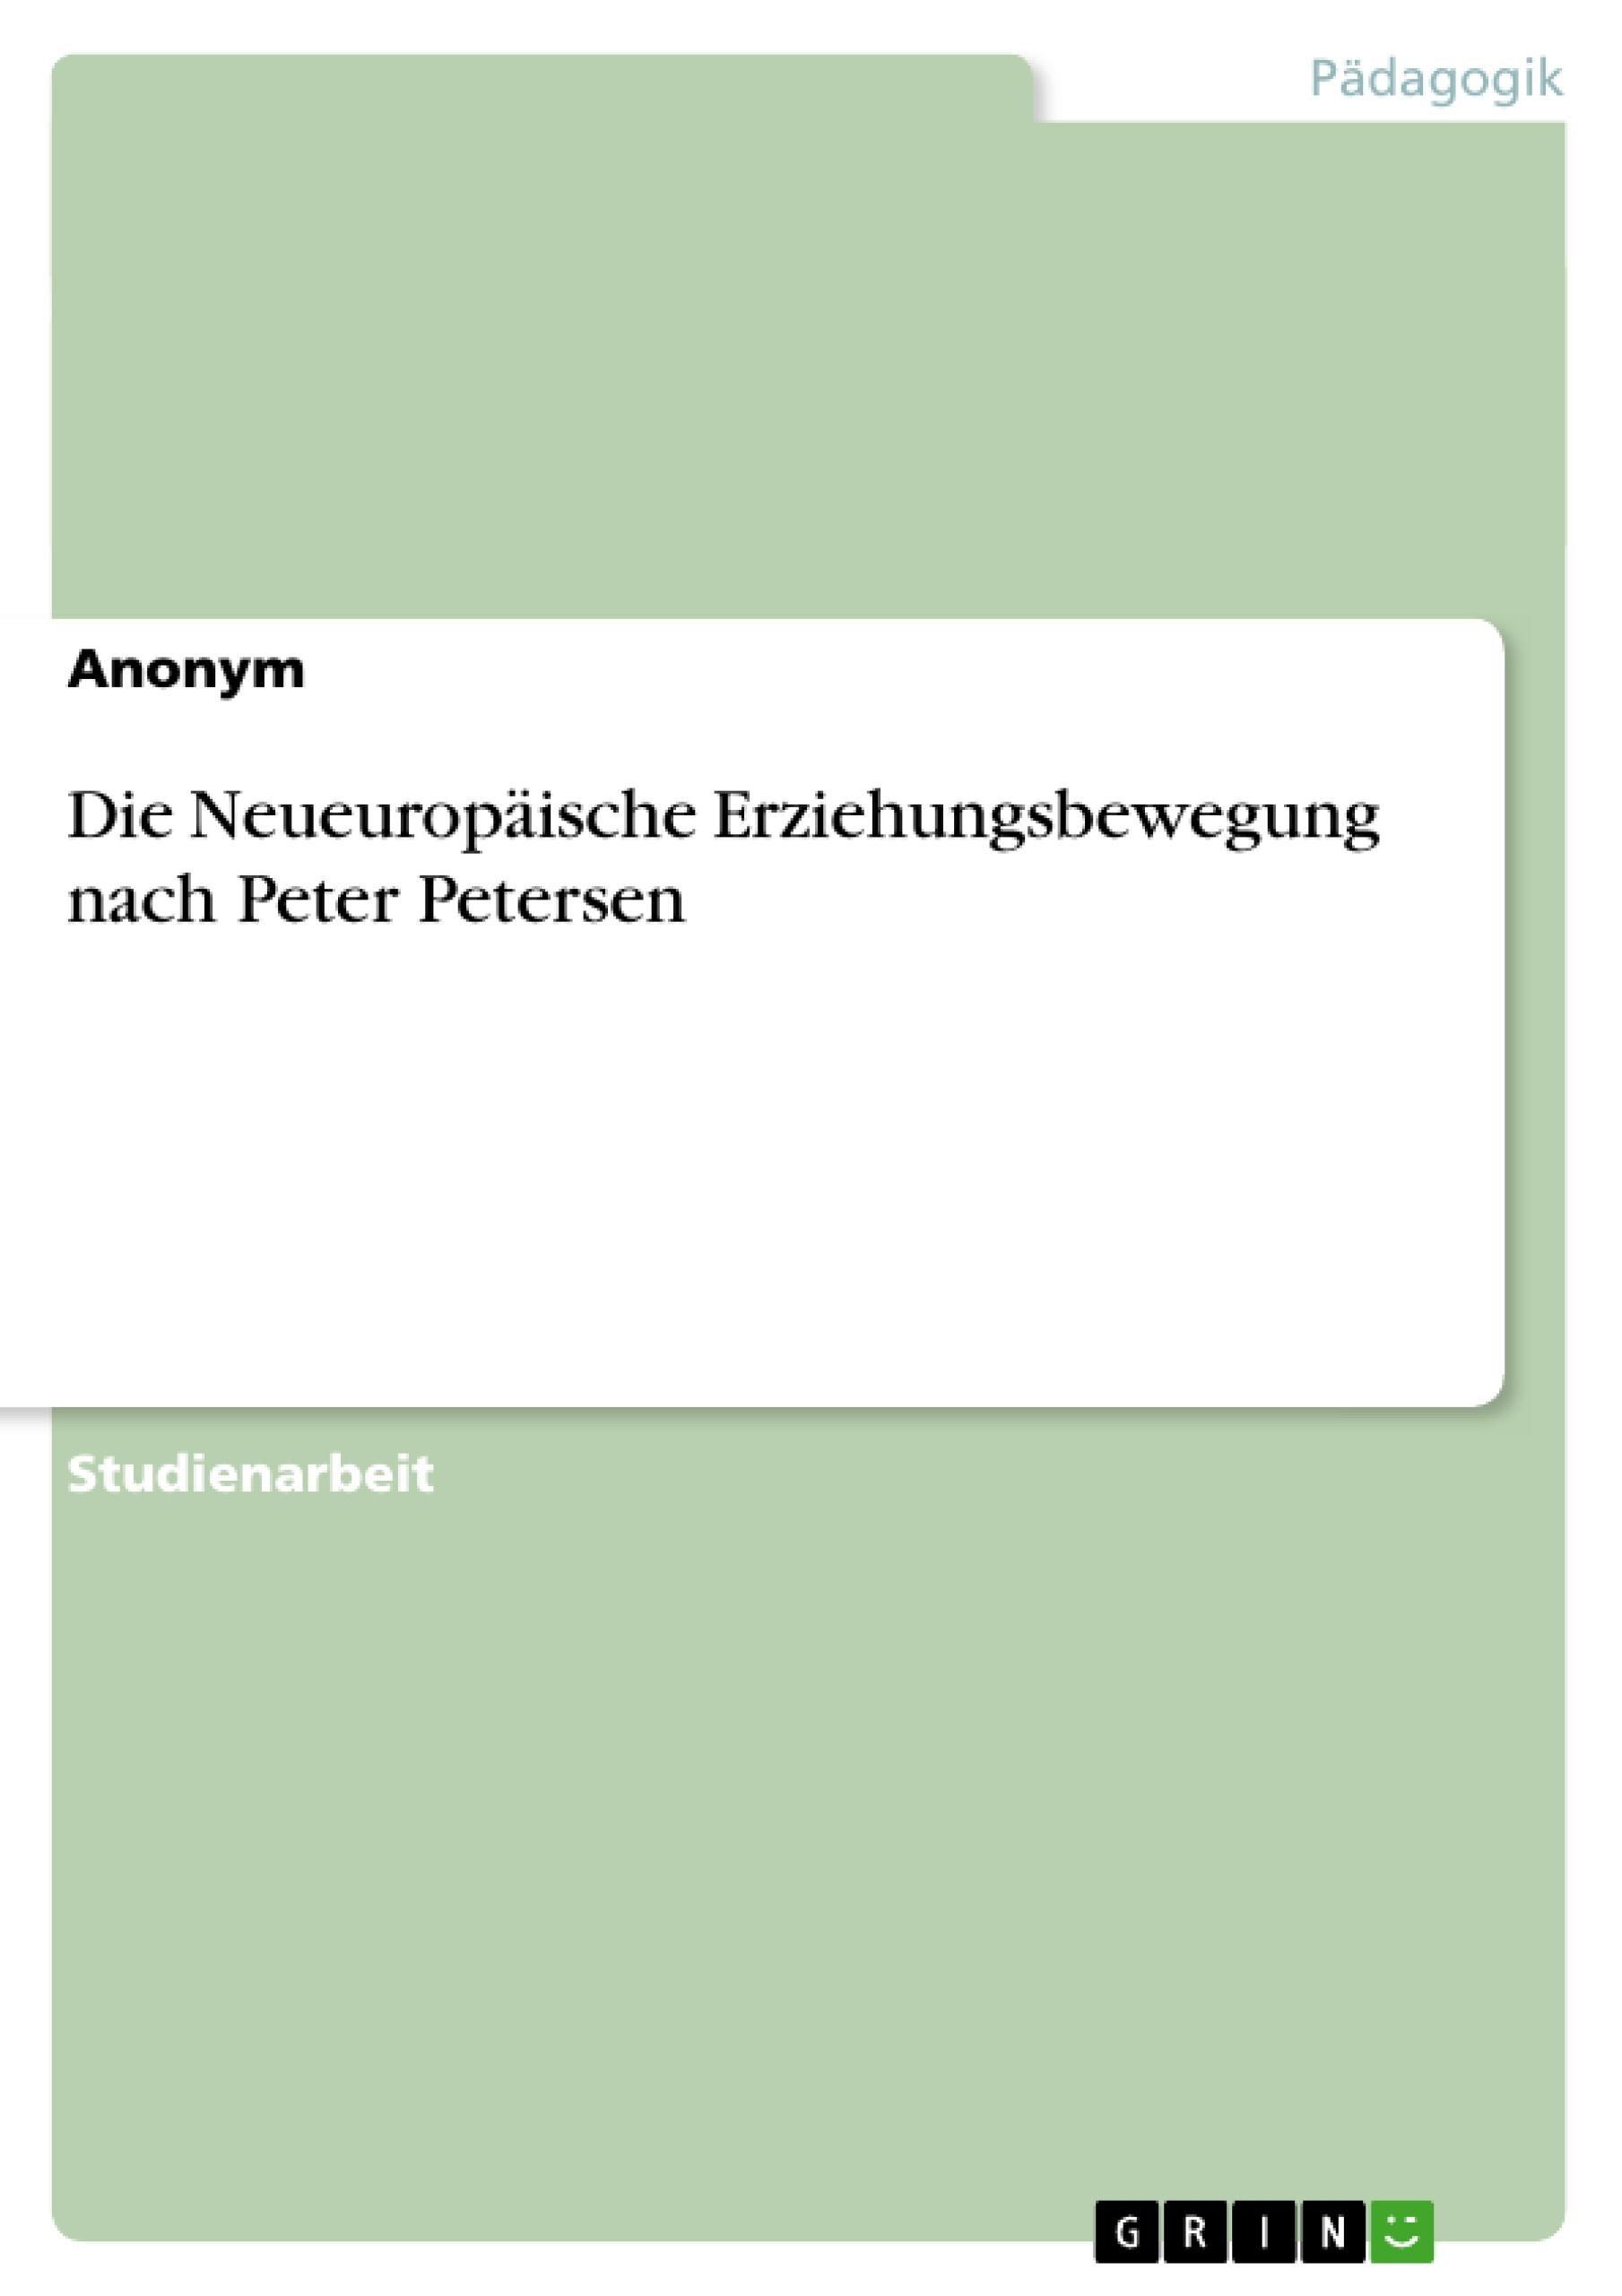 Titel: Die Neueuropäische Erziehungsbewegung nach Peter Petersen